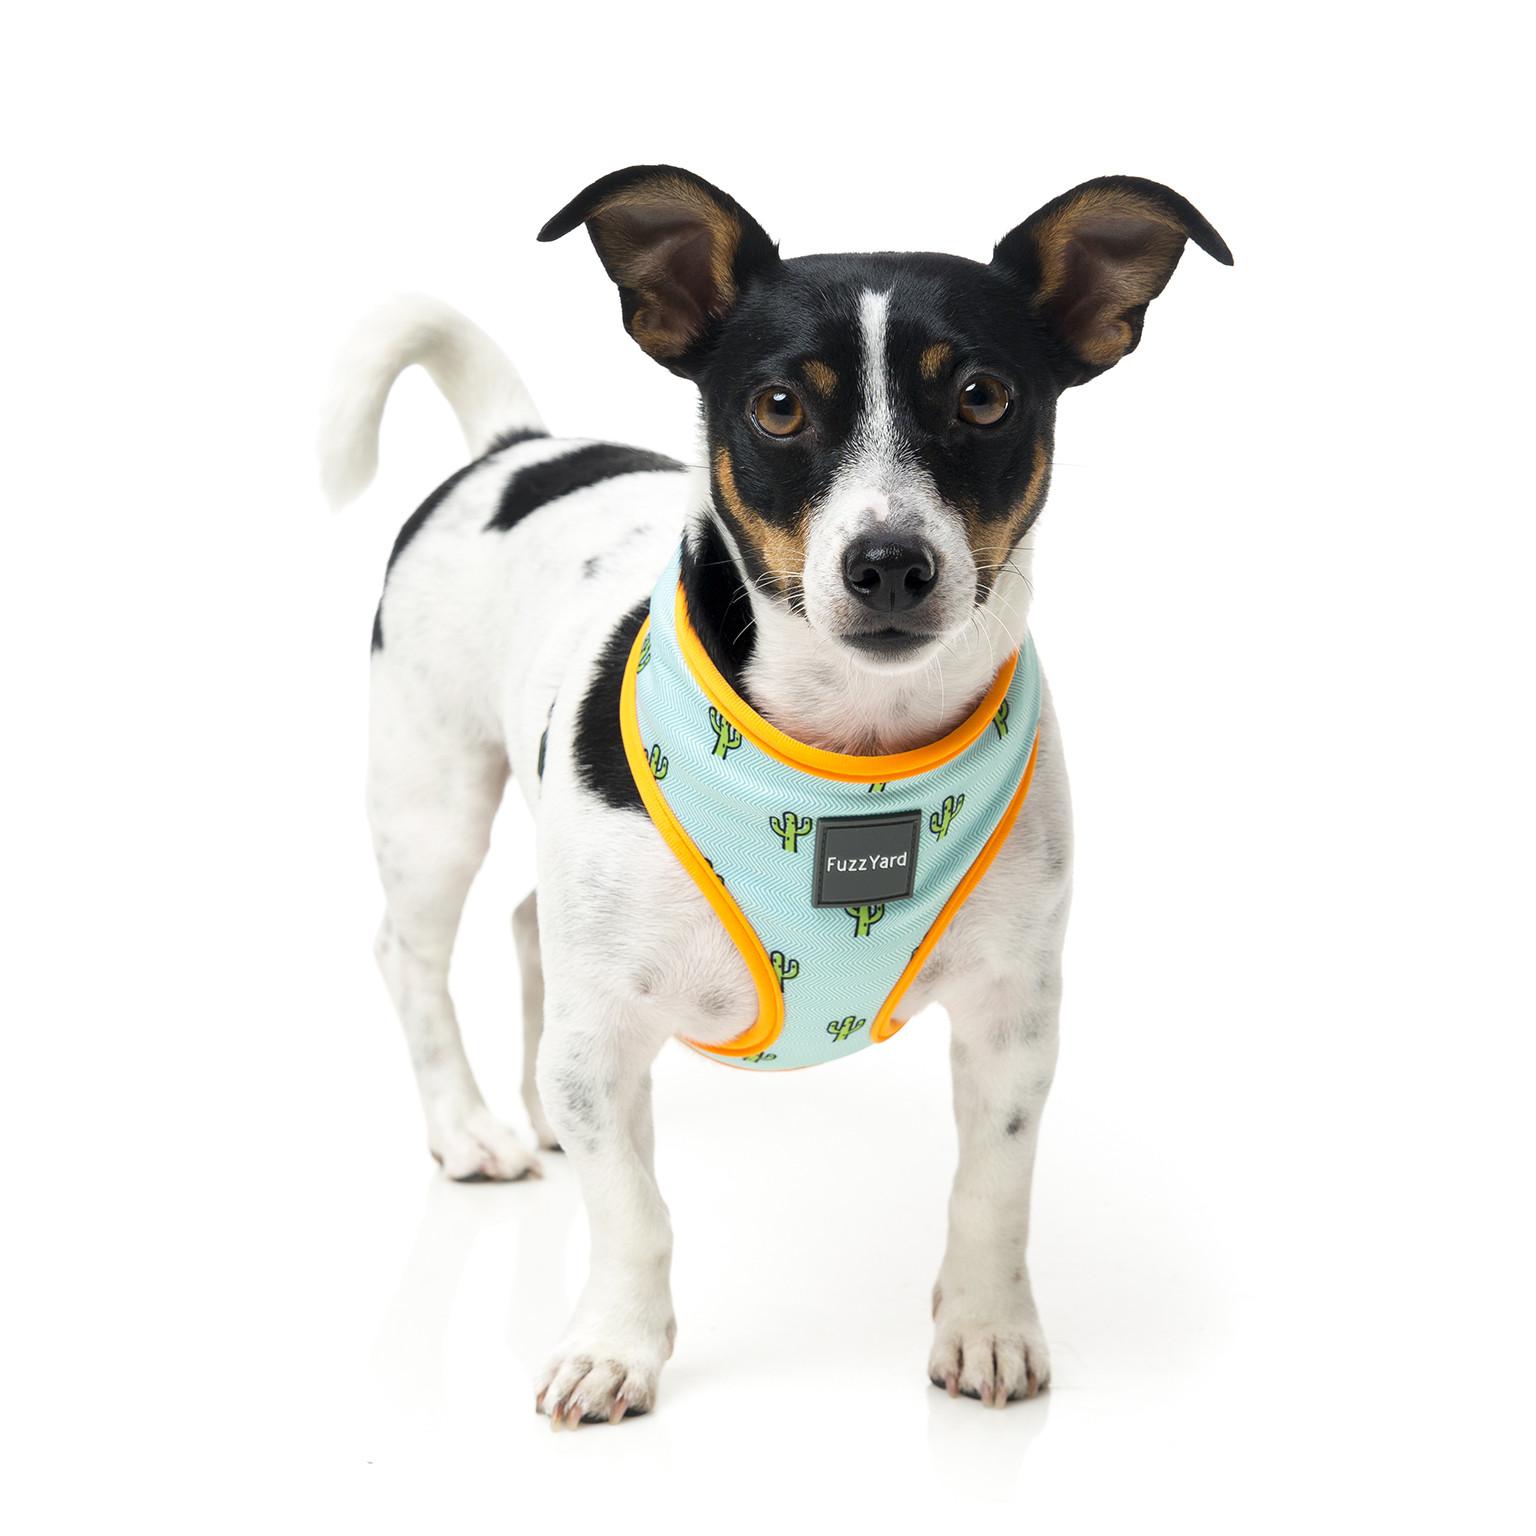 fuzzyard-harness-tucson-dog-1.jpg